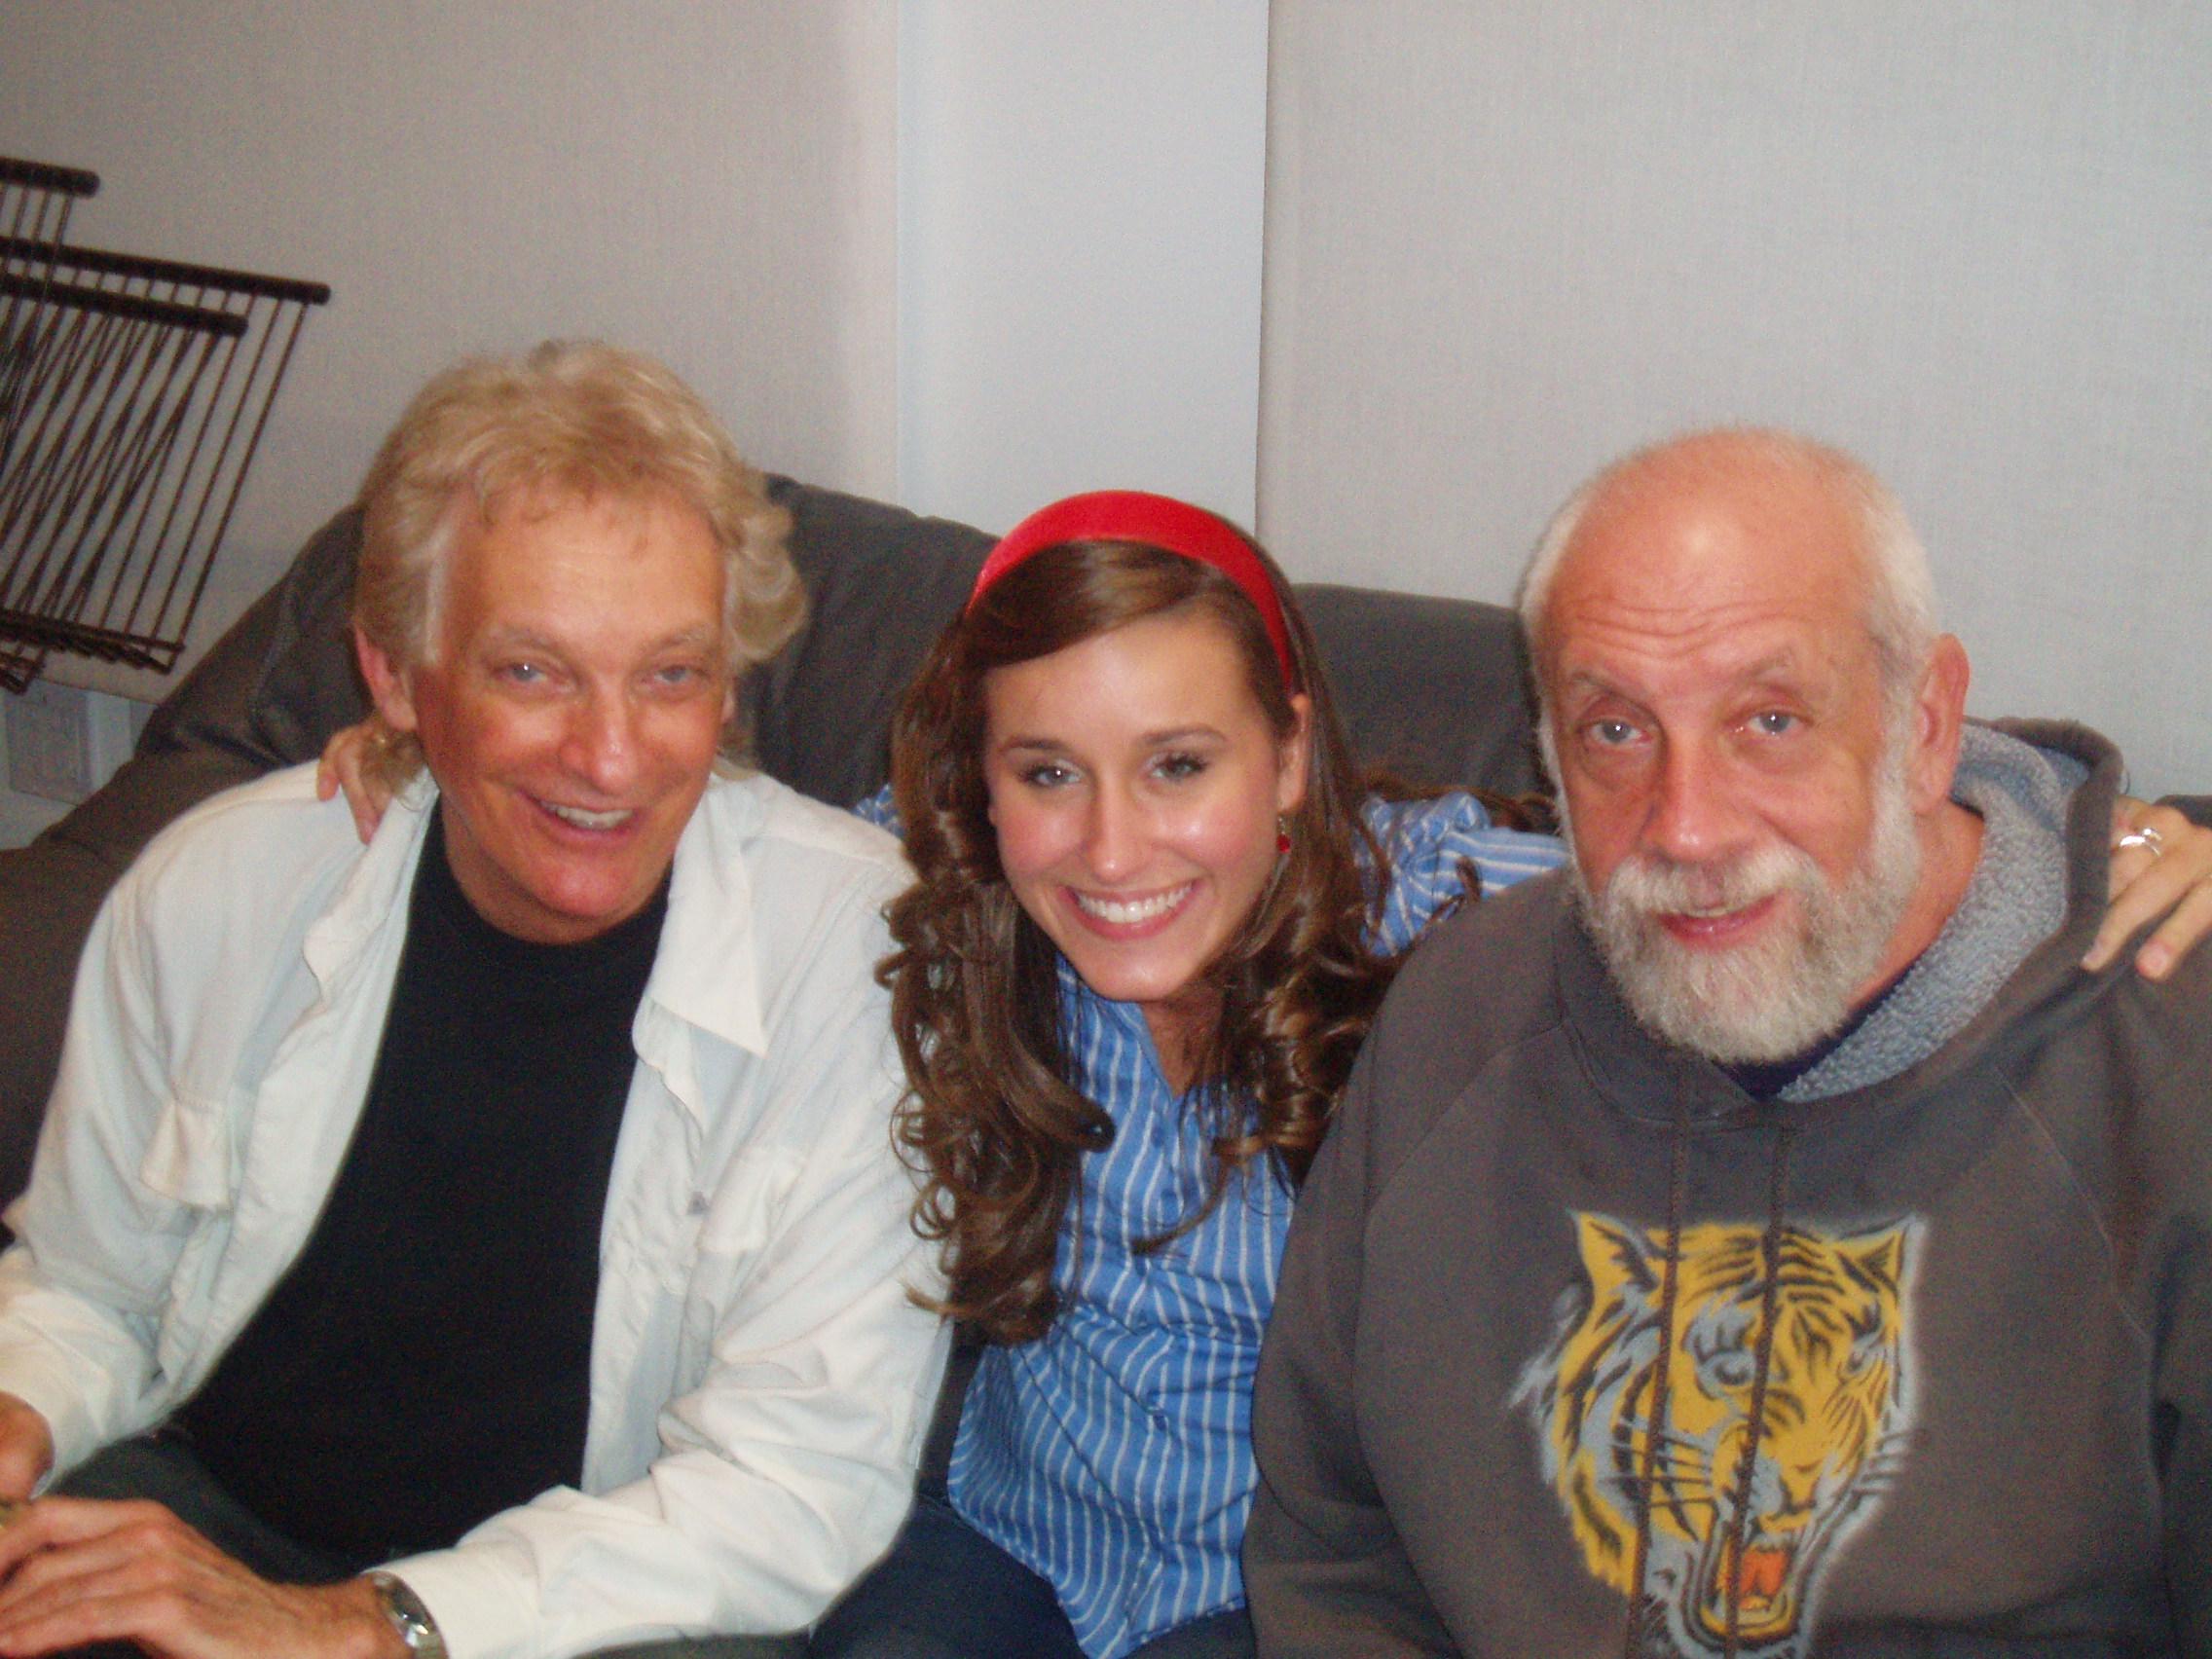 Lauren with Grammy award winning producers Joel Diamond and Joel Dorn